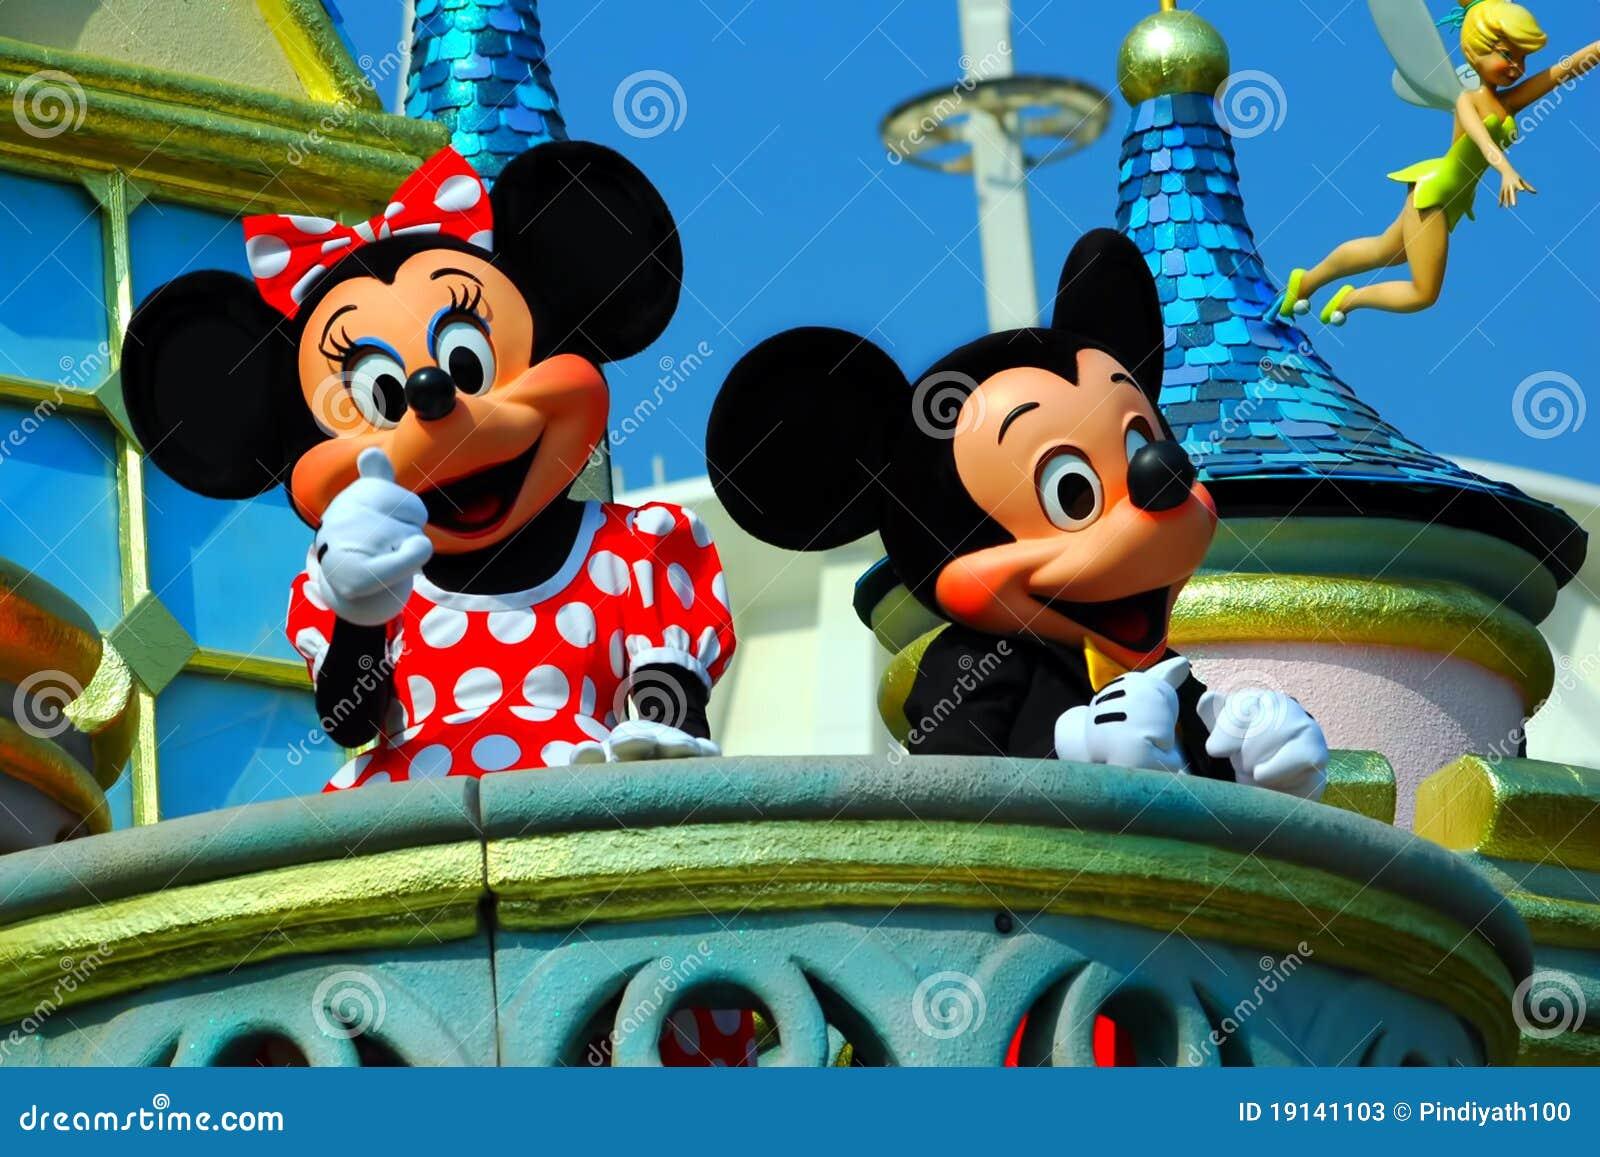 Mickey et souris de minnie